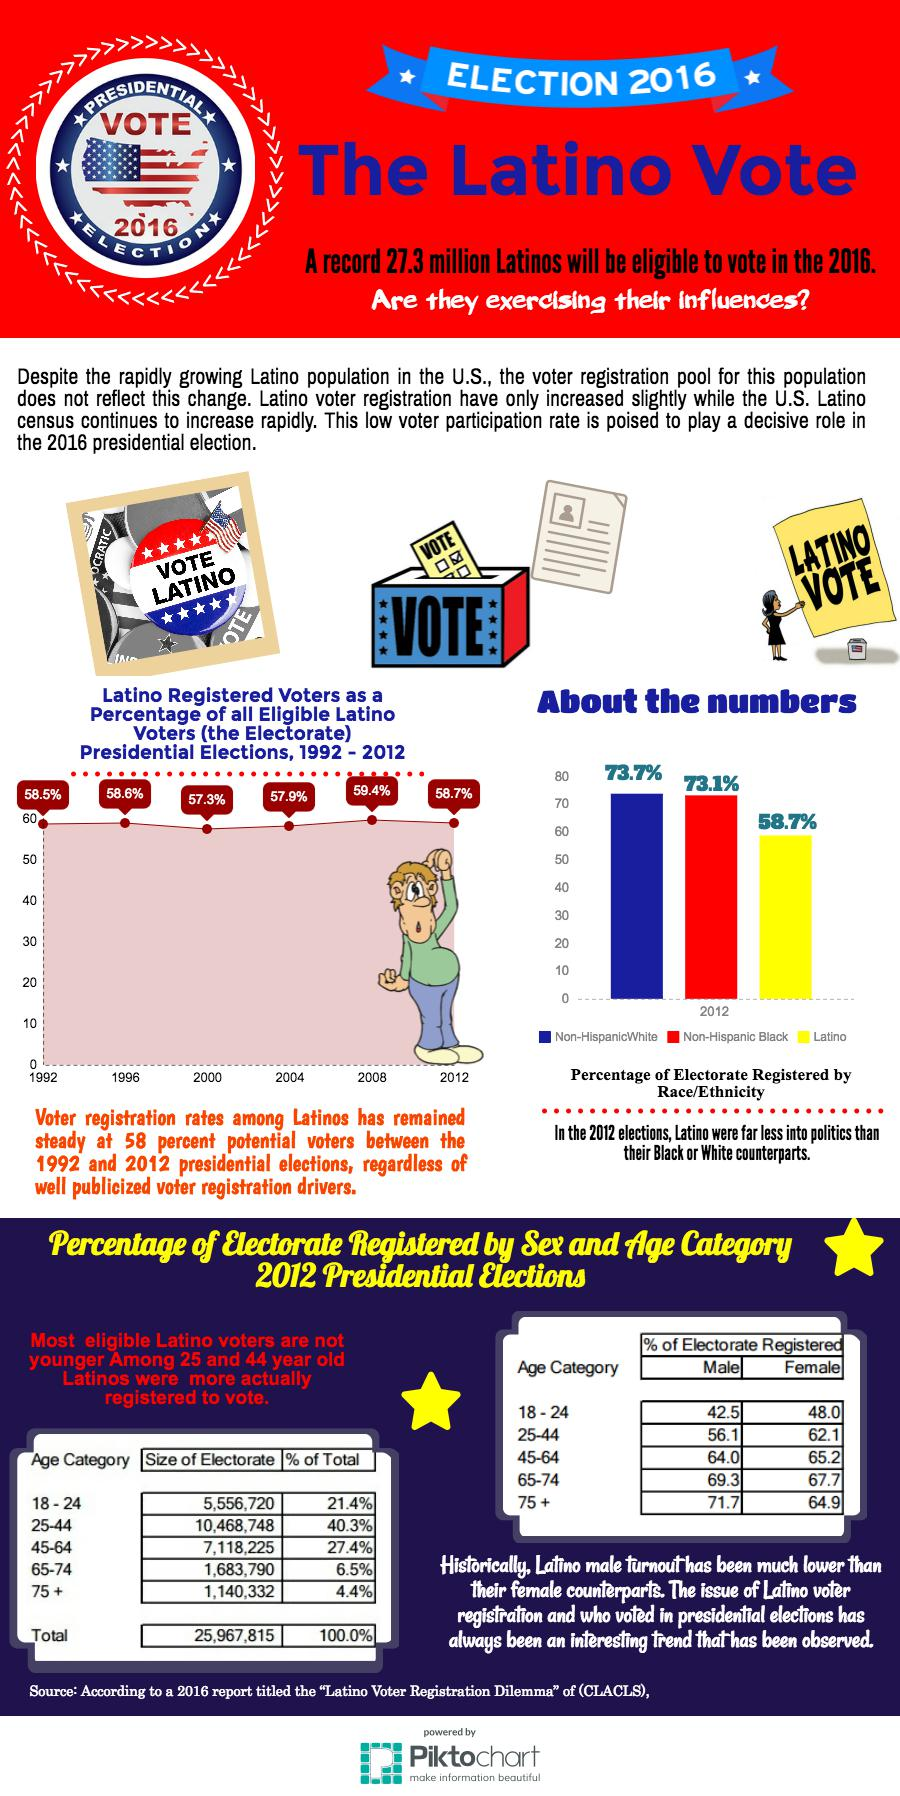 the-latino-vote_16980871_5d8a590ae9cac042c23e6a52c7f8f72f95161824